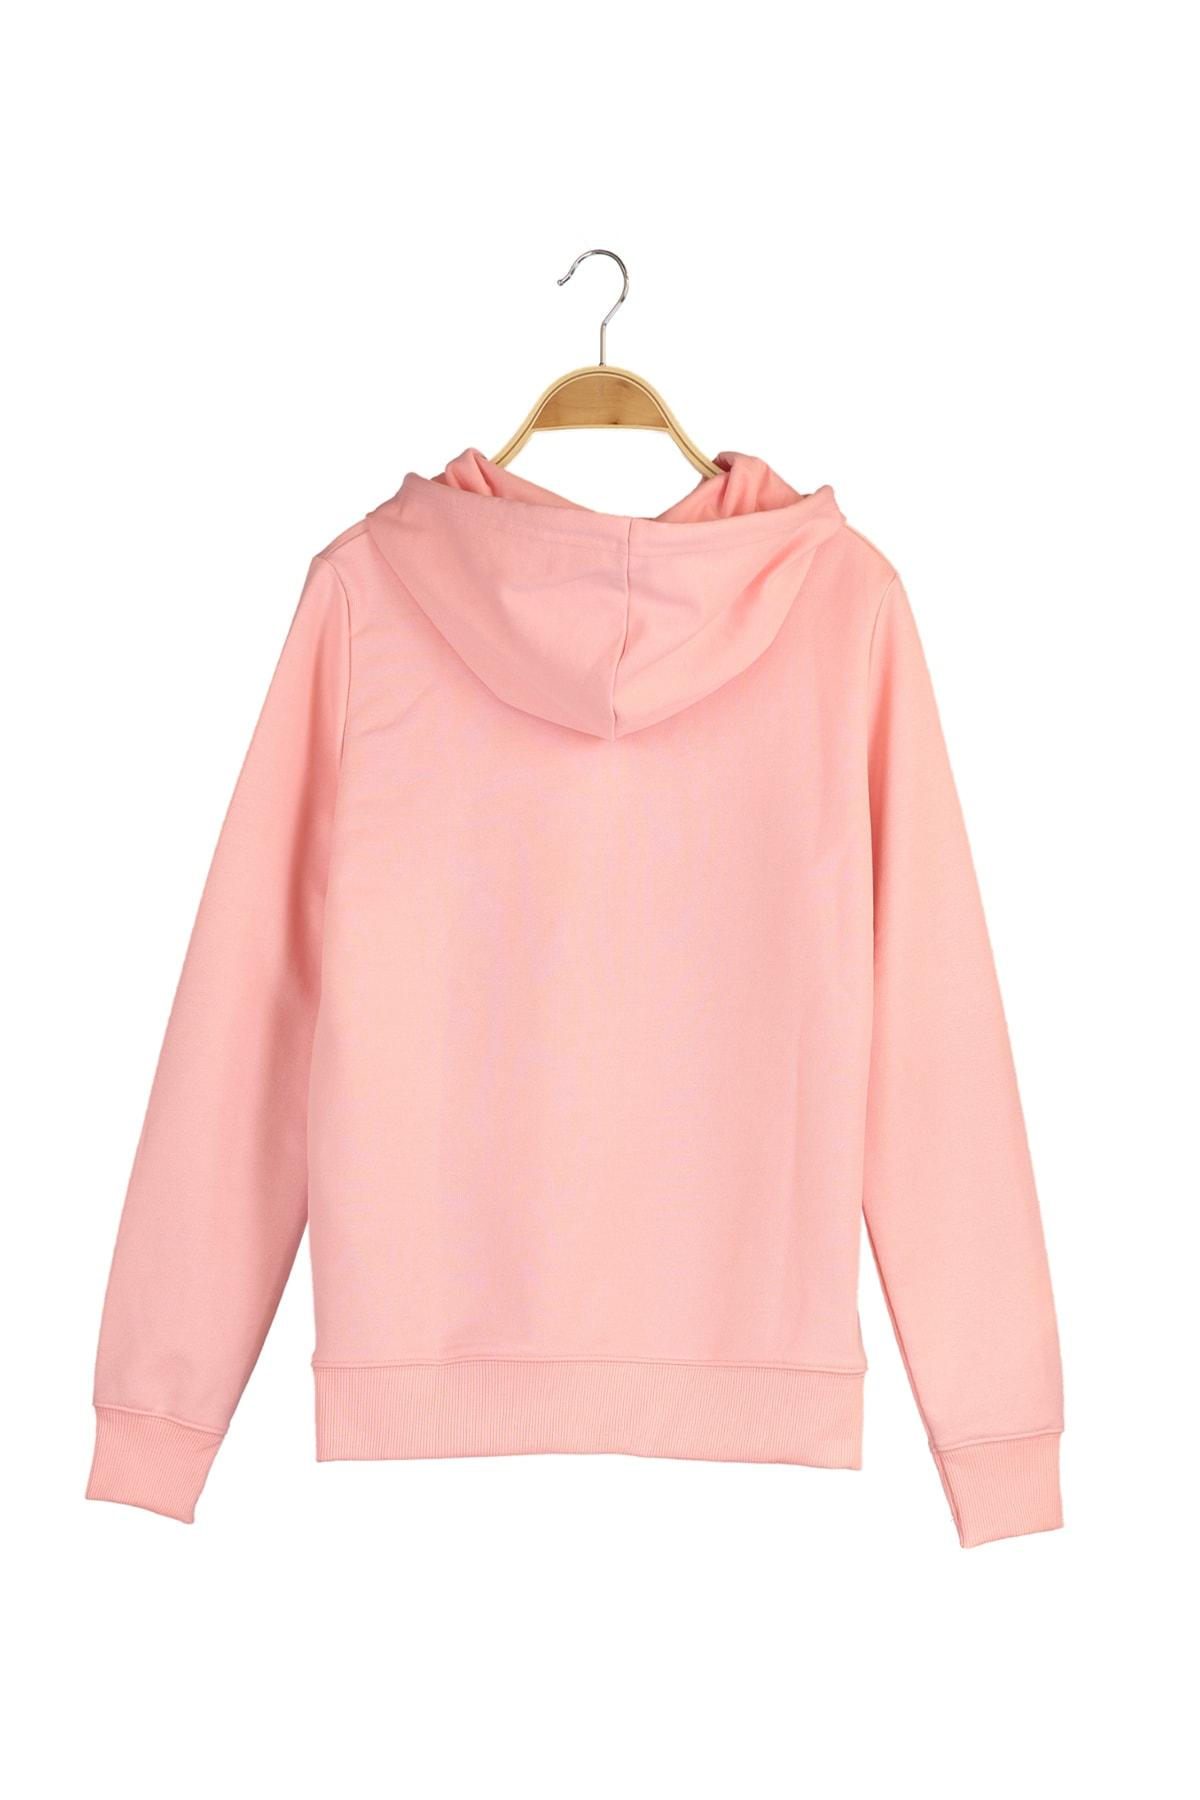 New Balance Kadın Sweatshirt - V-WTH804-FJI 2